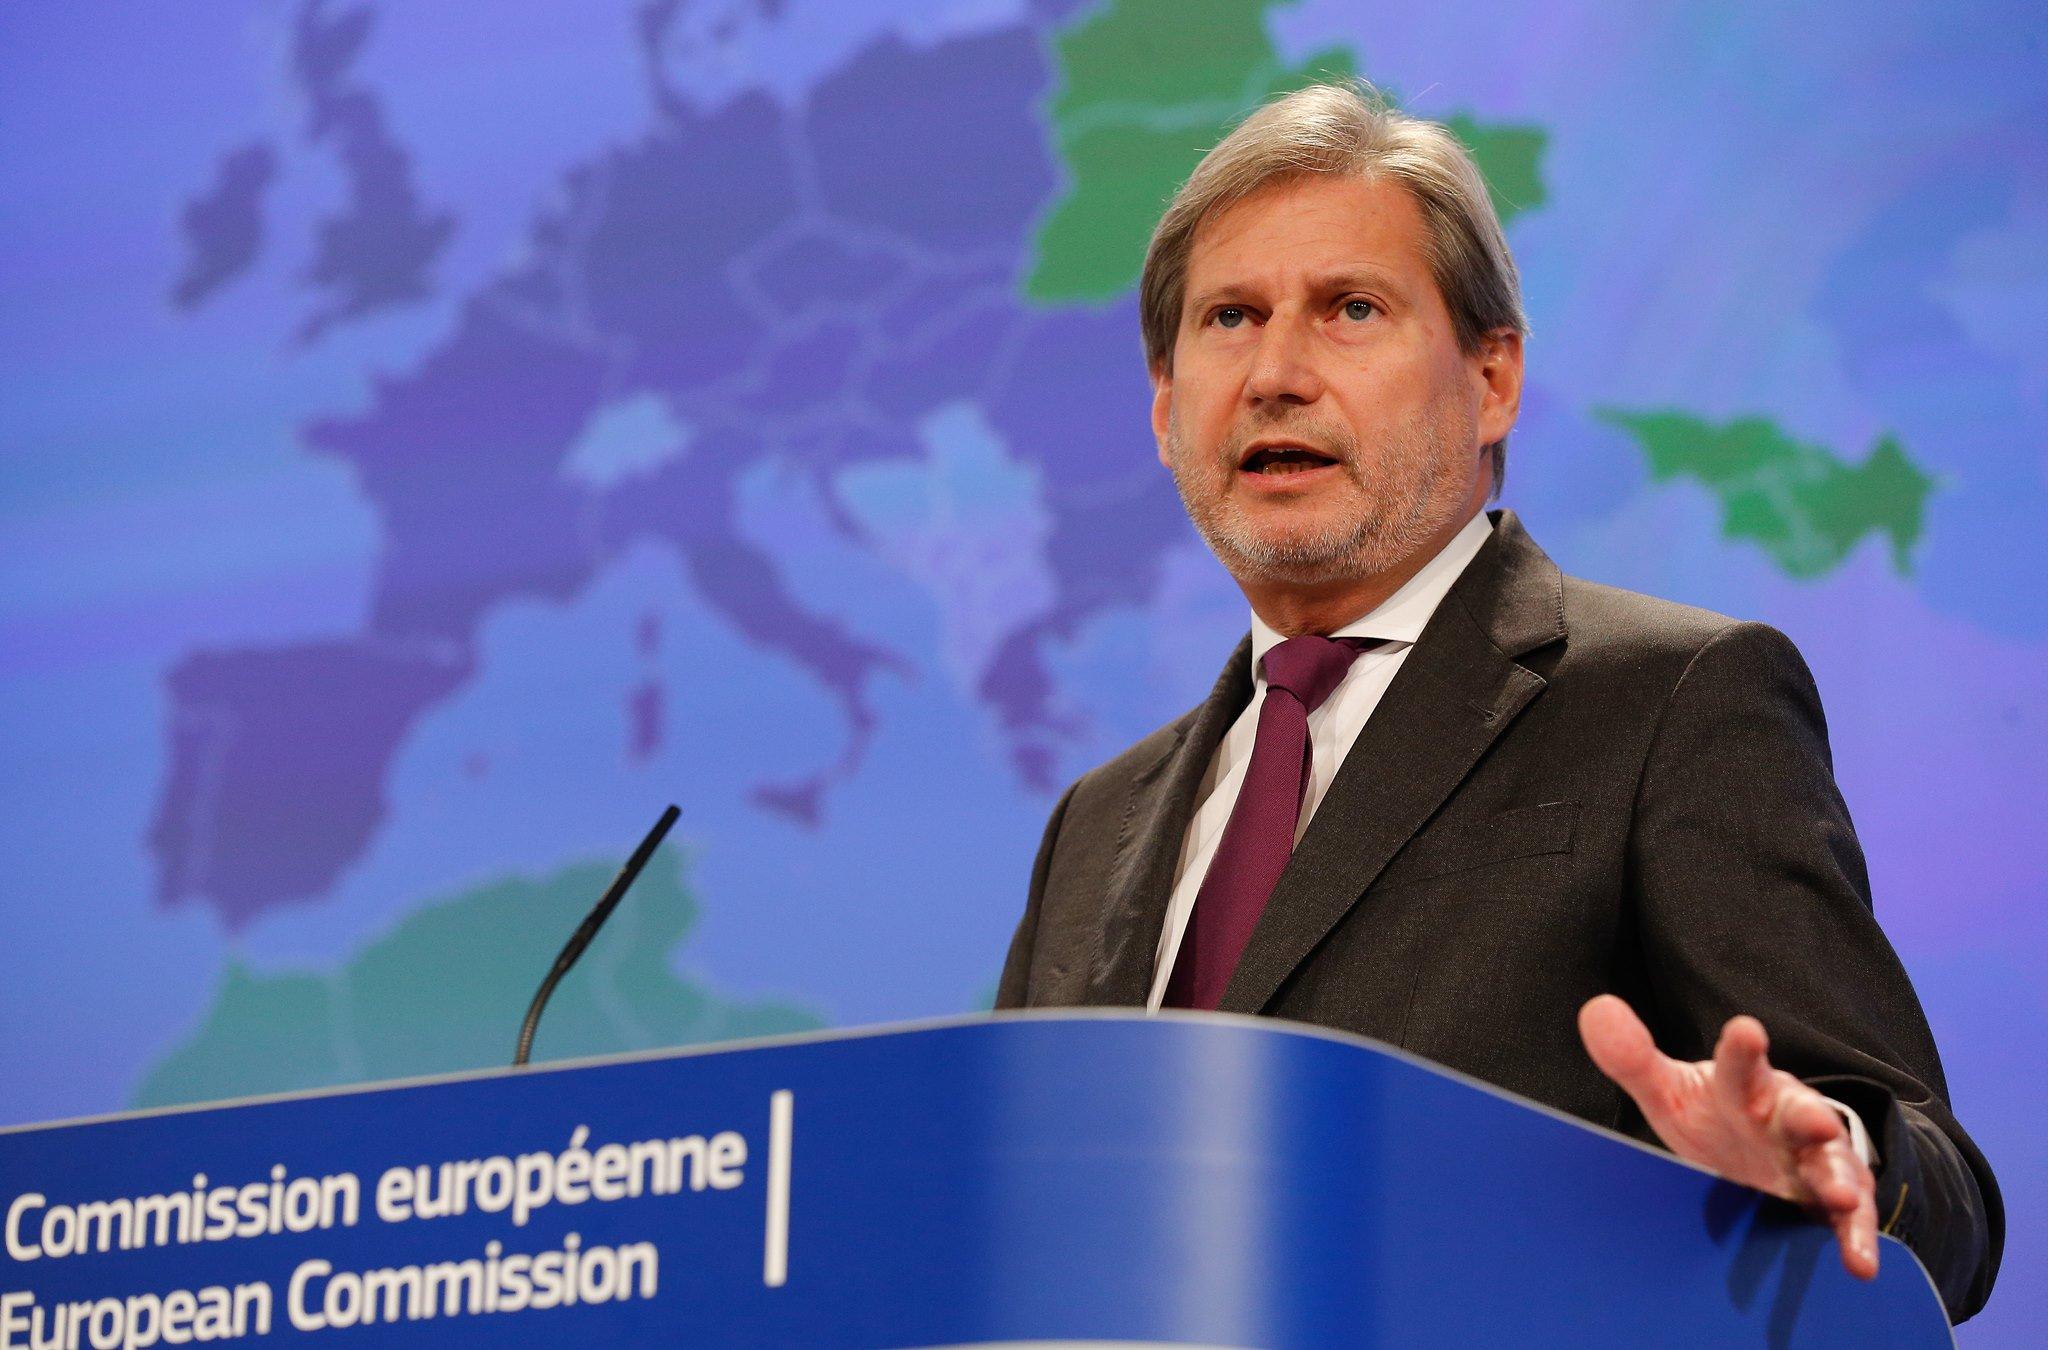 Sporazum iz Prespe može poslužiti kao dobar primer za region, kaže Hahn